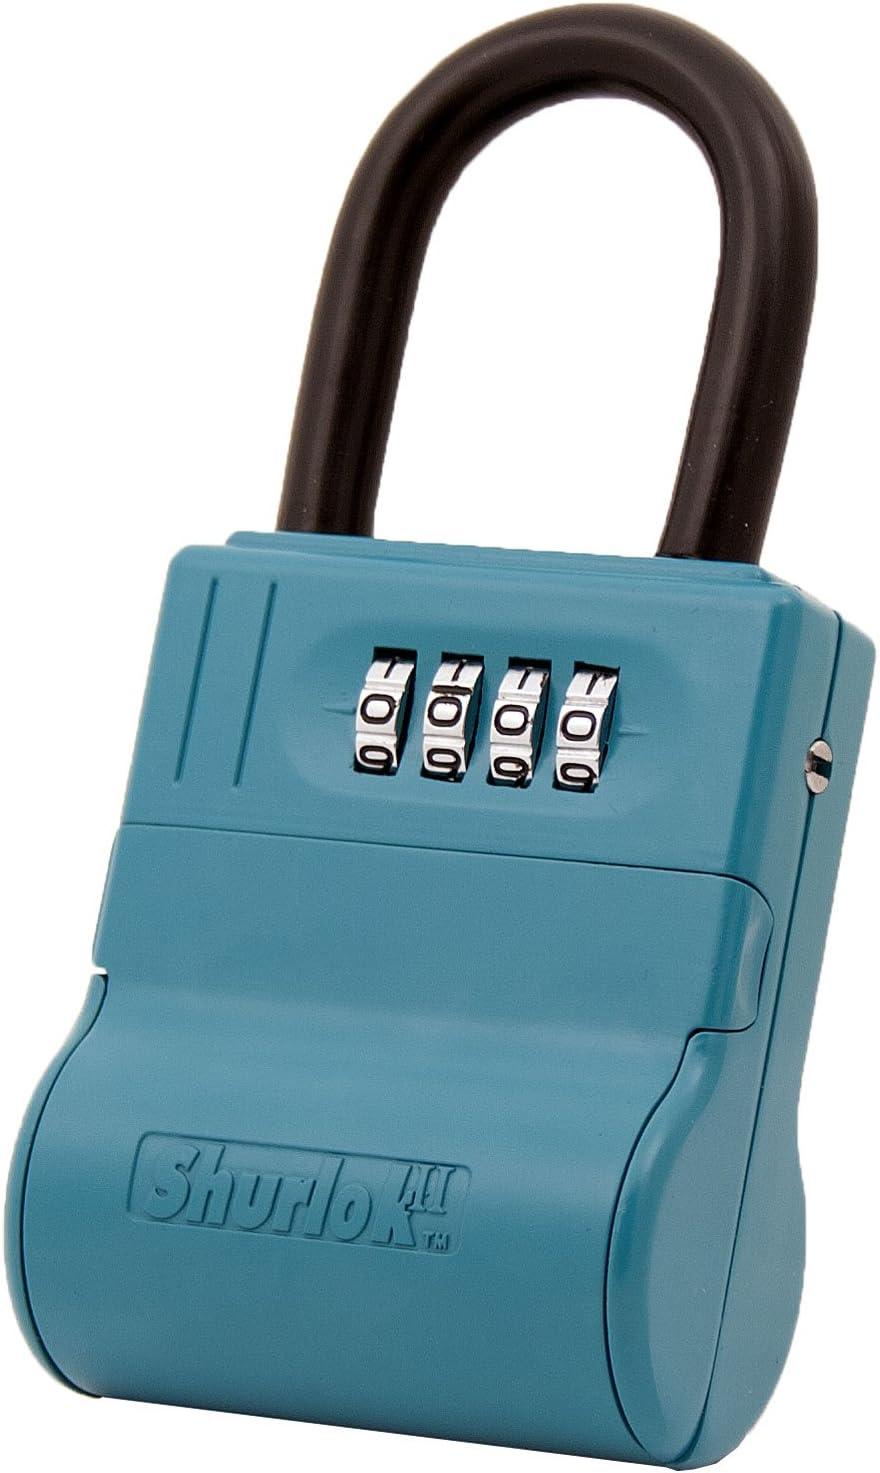 ShurLok SL-600W 4 Dial Numbered Key Storage Combination Lock Box, Blue